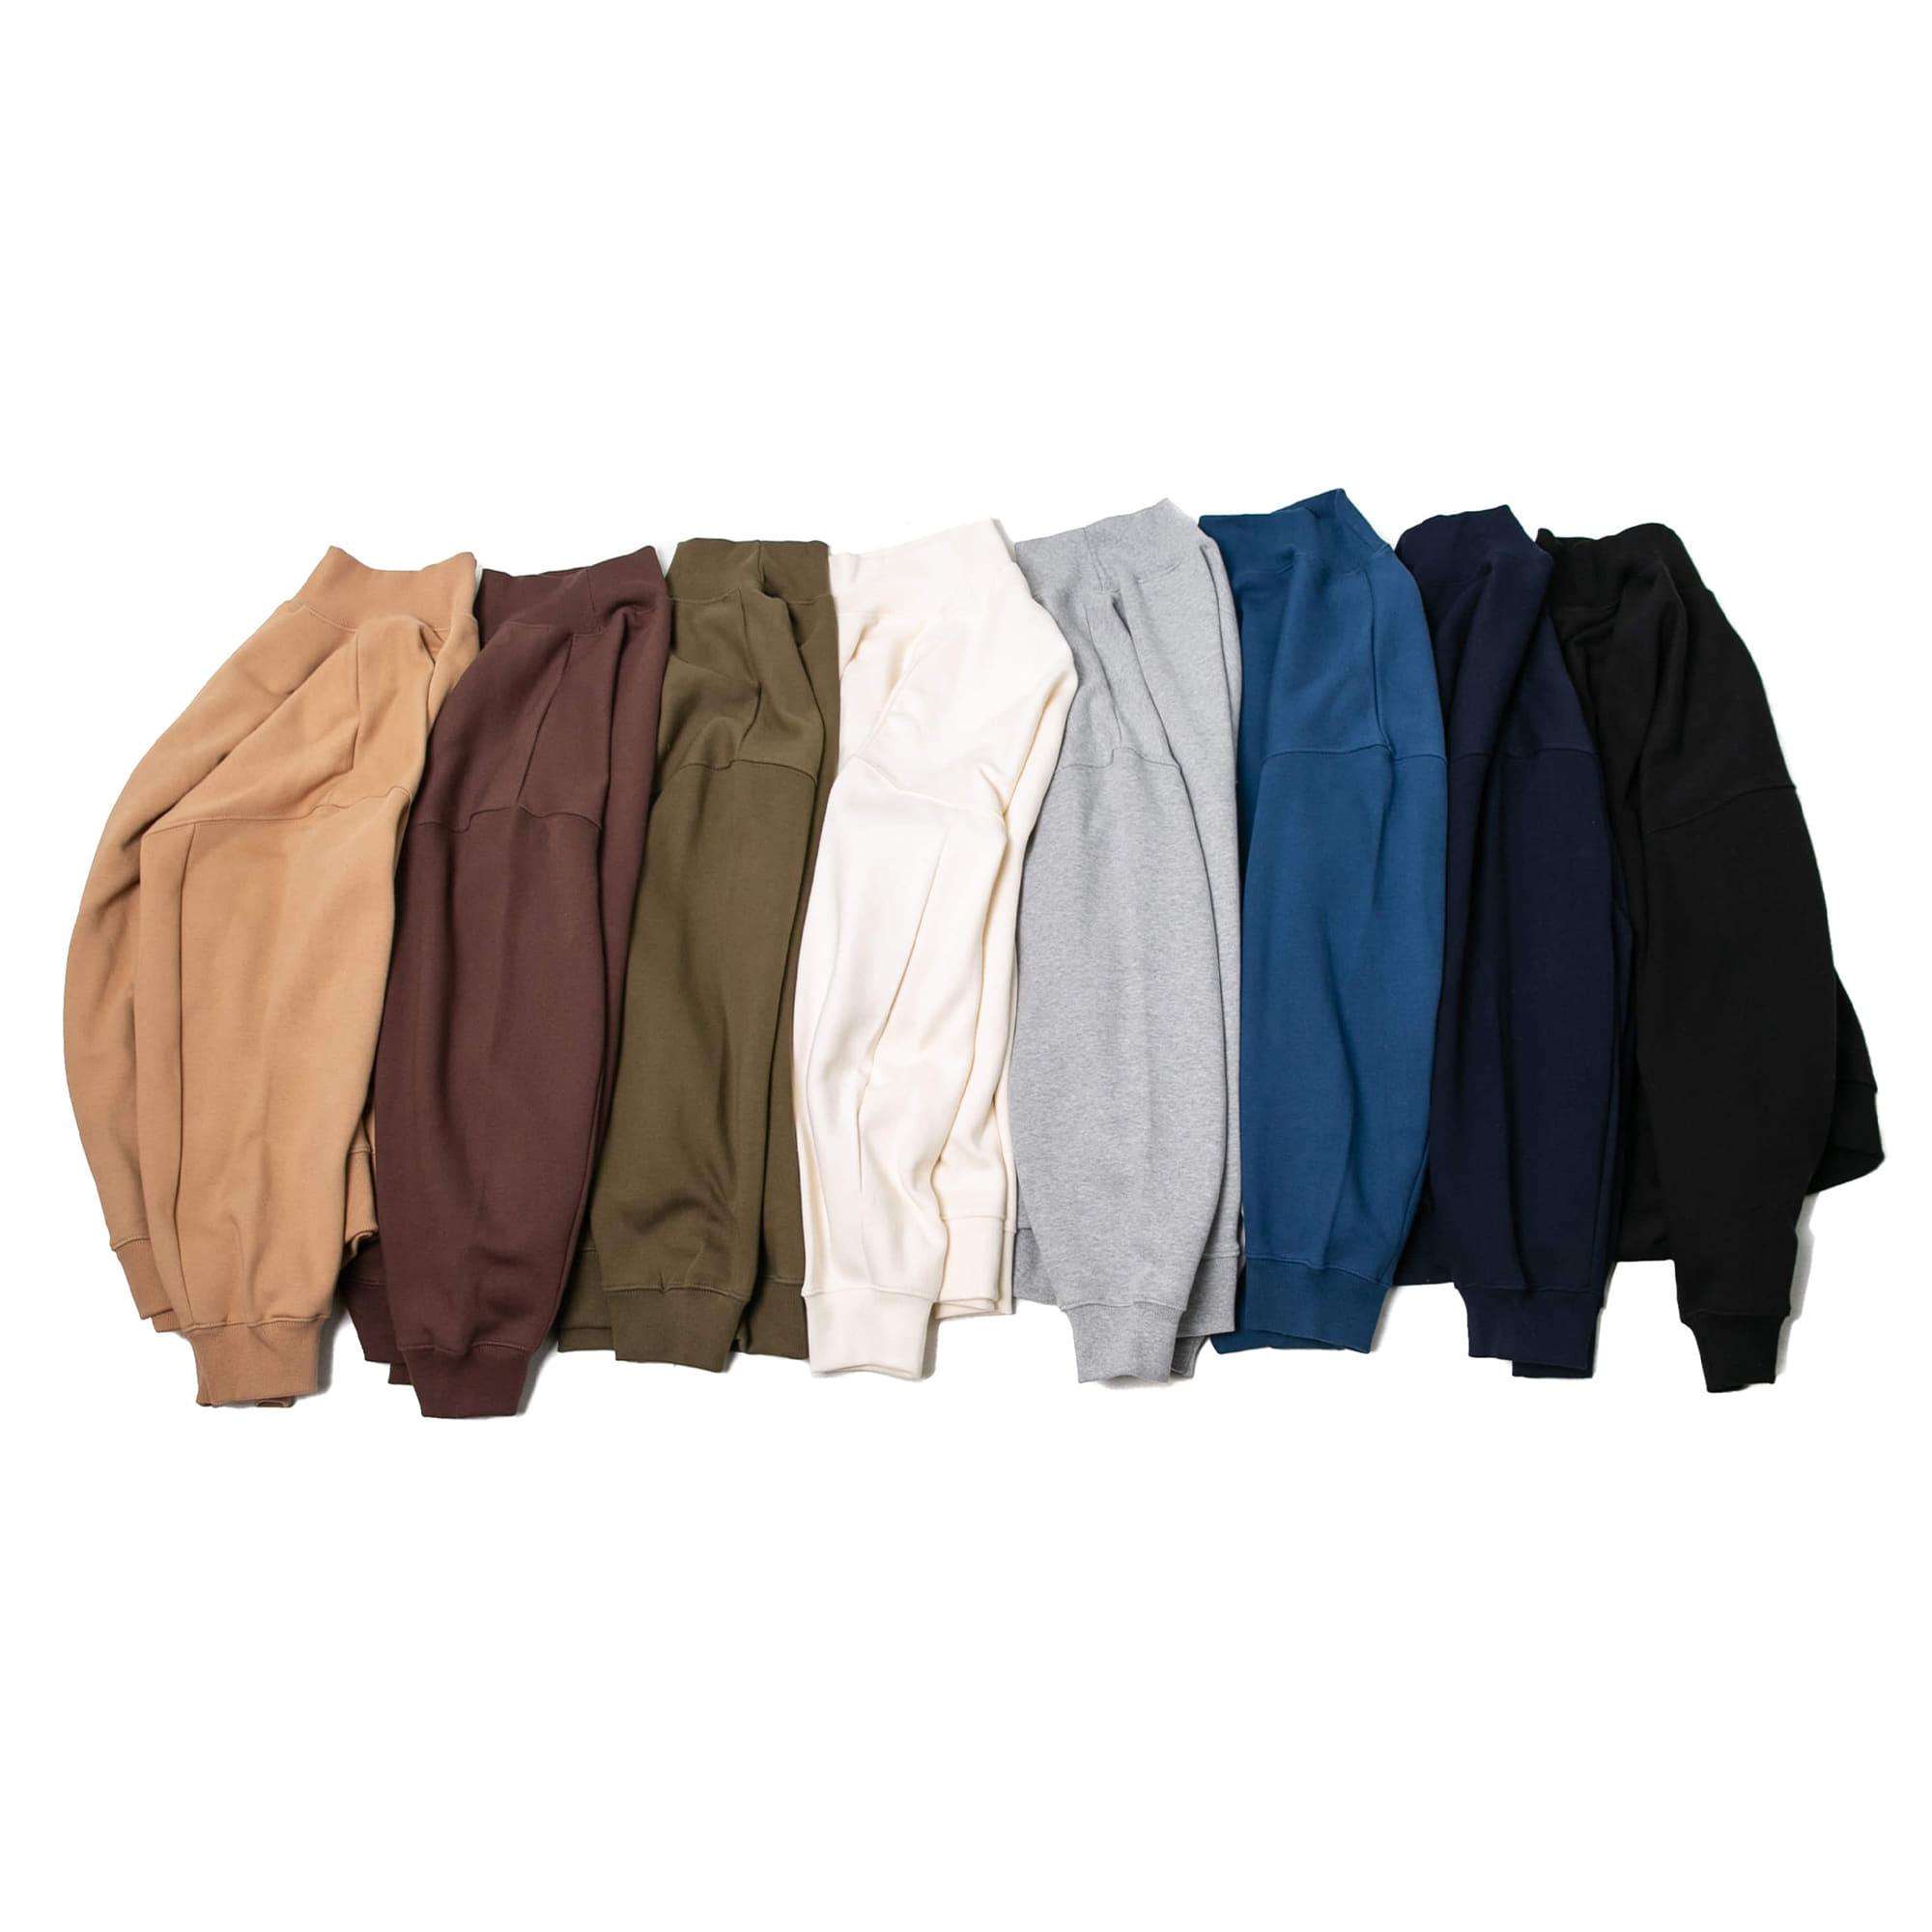 Mock Neck Over Sweat Shirt - 8 color